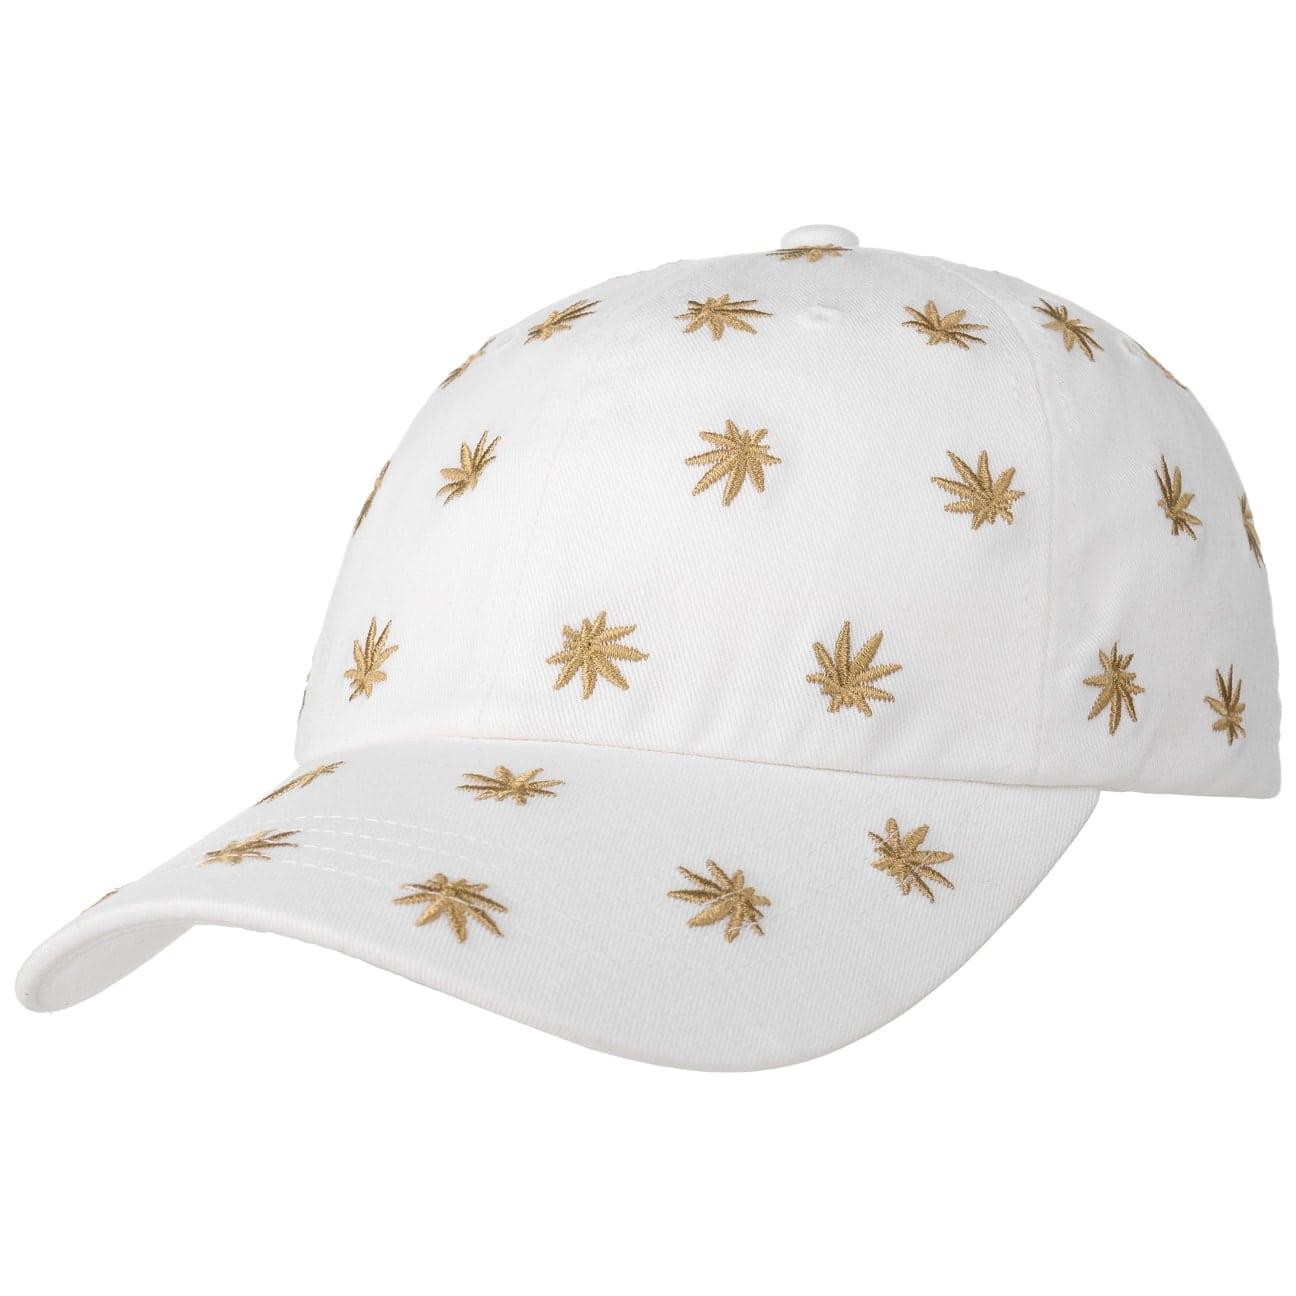 Gorra Allover Dad Hat Strapback by HUF